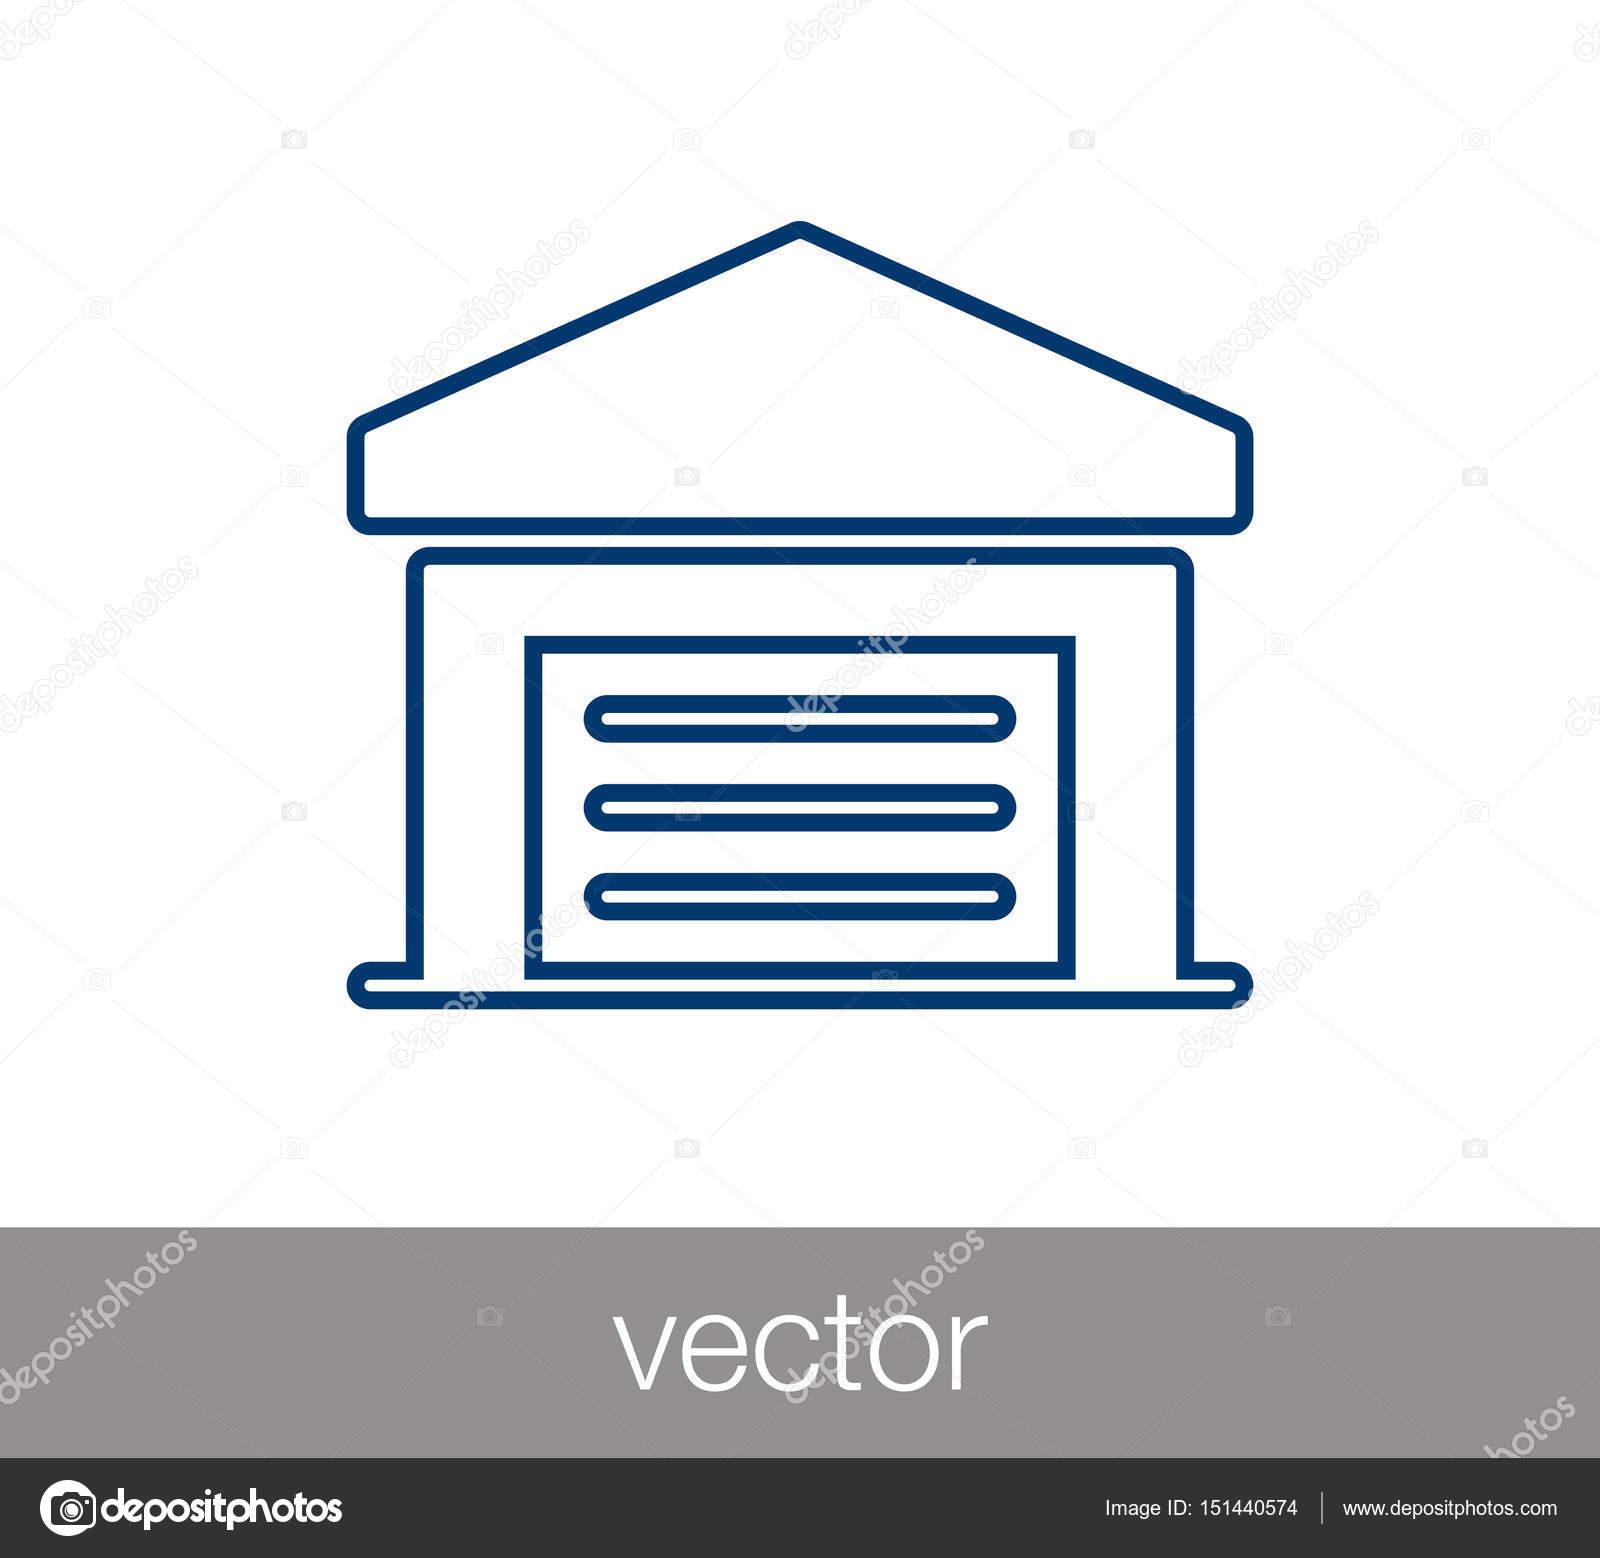 Garage Symbol. Parkplatz Symbol. Lagerung Haus Symbol. Vektor Illustration  U2014 Vektor Von Signsandsymbols@email.com